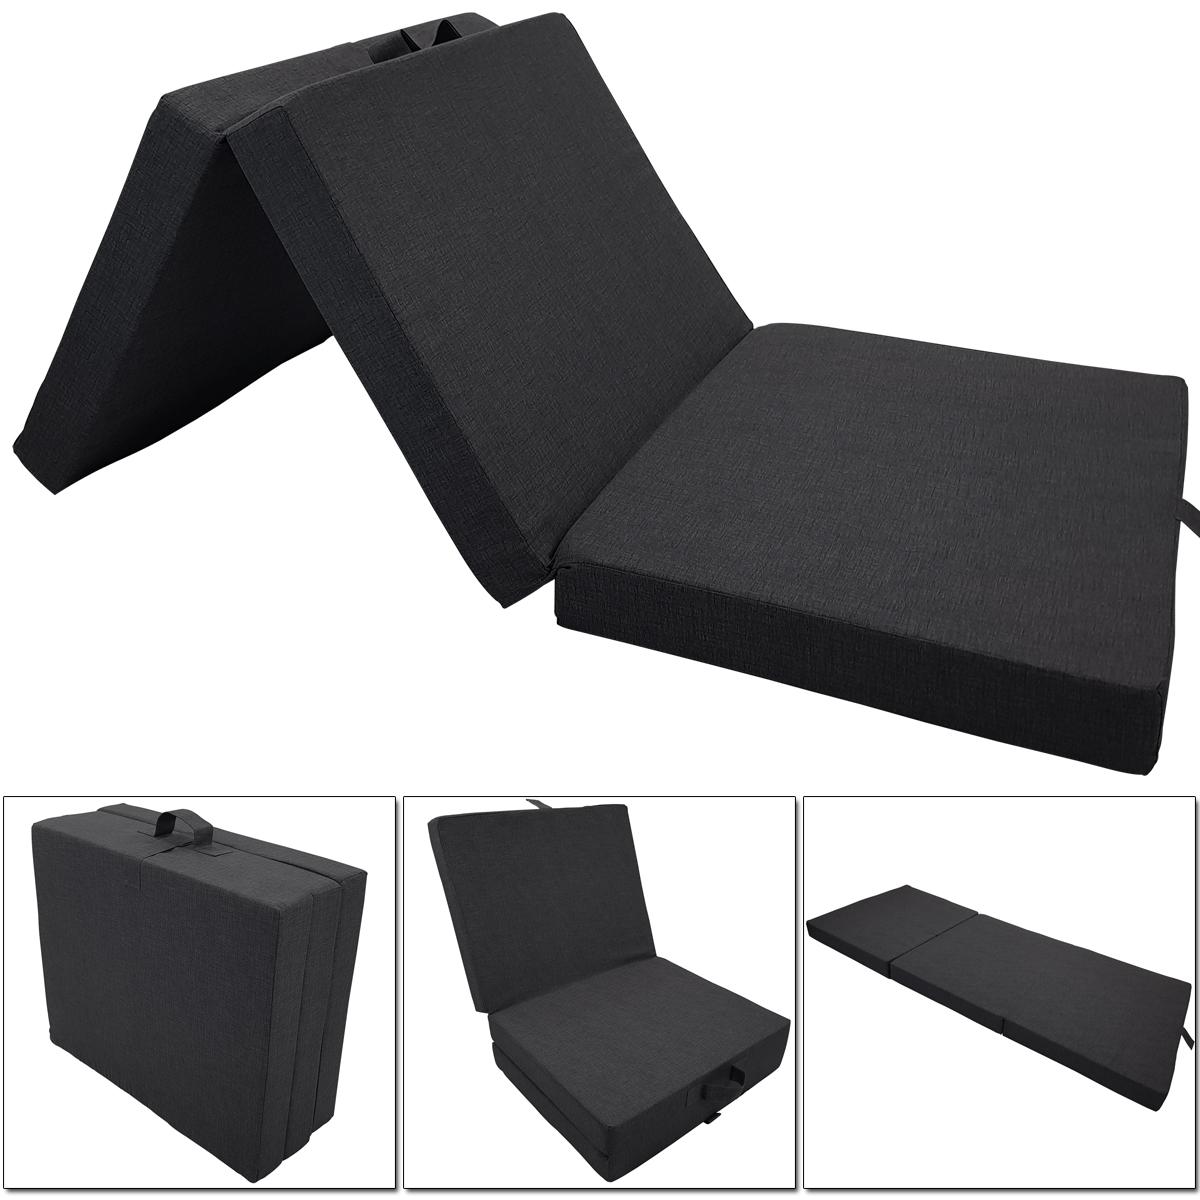 premium outdoor klappmatratze faltmatratze reisematratze. Black Bedroom Furniture Sets. Home Design Ideas